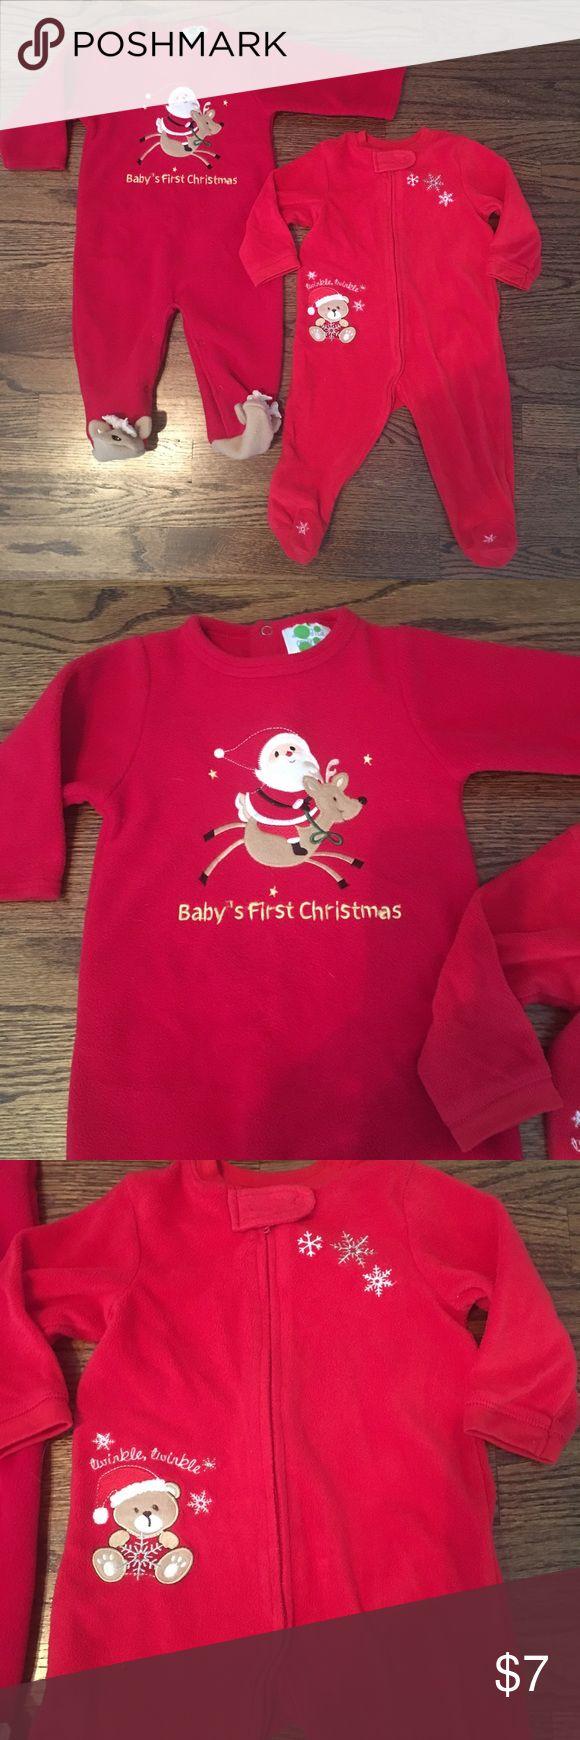 9m Christmas footie pajamas .Christmas footie pjs. Good condition. Very soft fleece One Pieces Footies